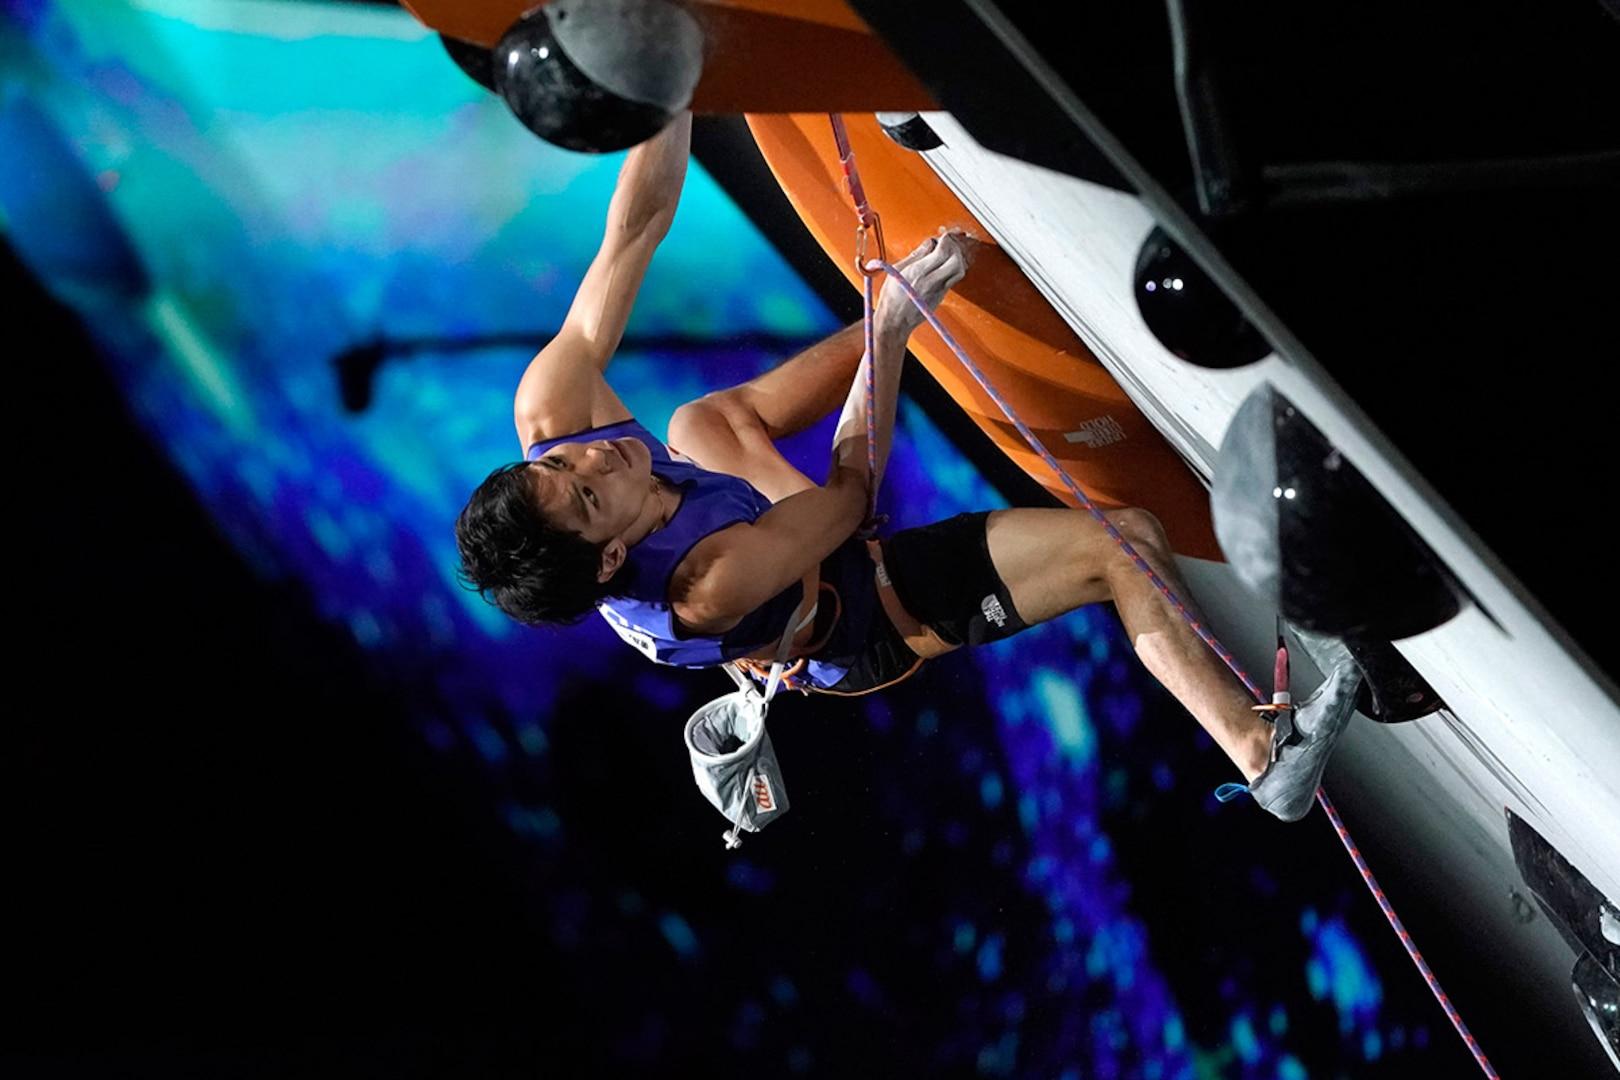 Tomoa Narasaki competes at the 2019 Sport Climbing World Championships